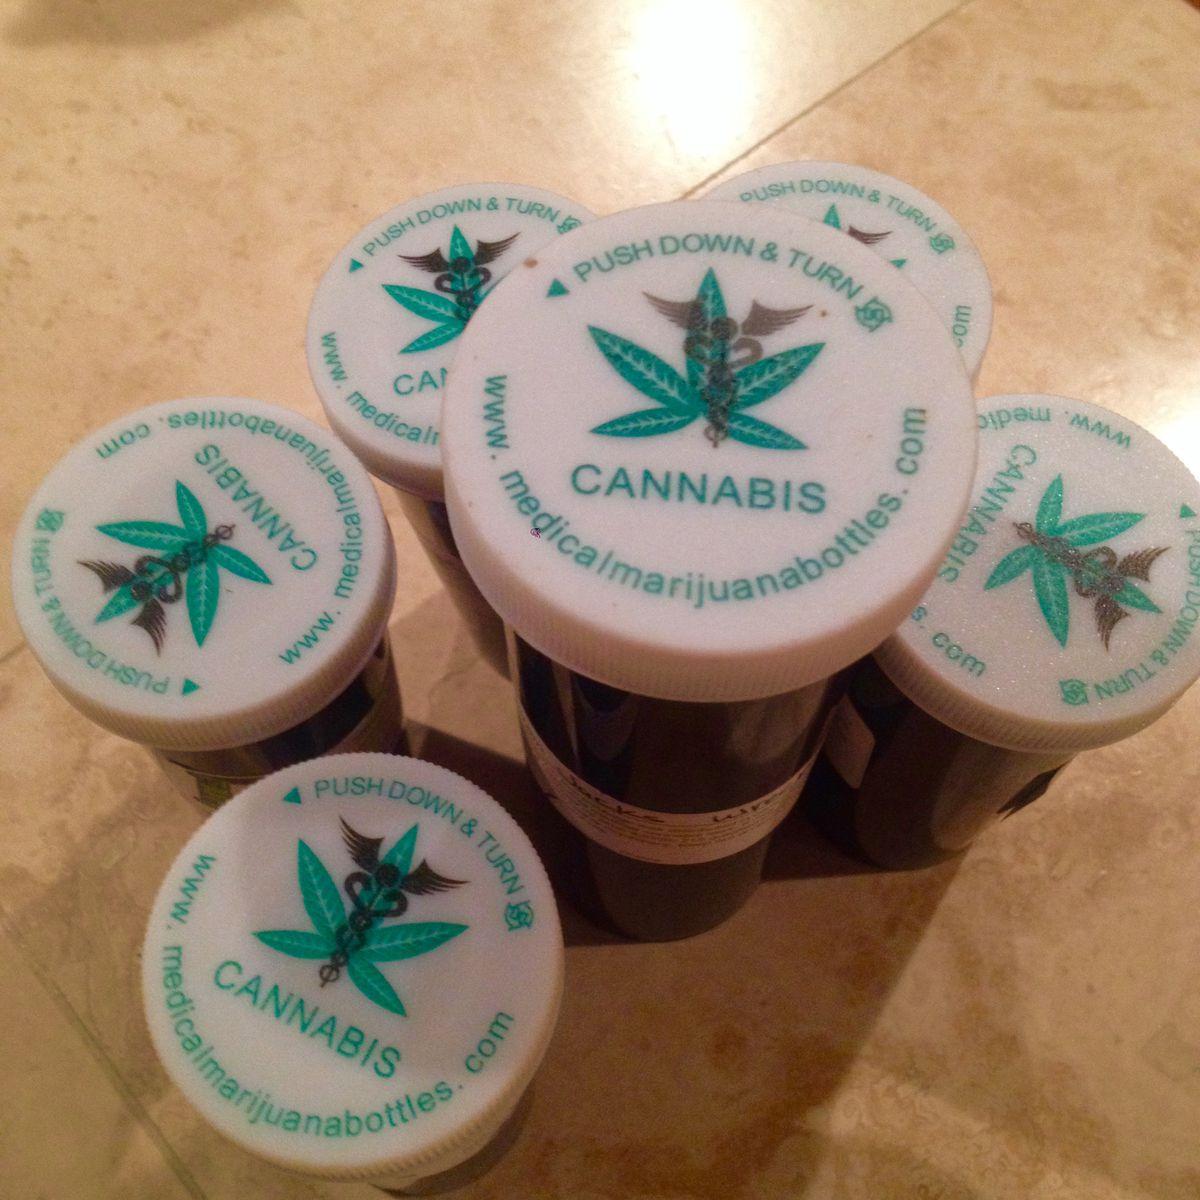 Bottles of medical marijuana.